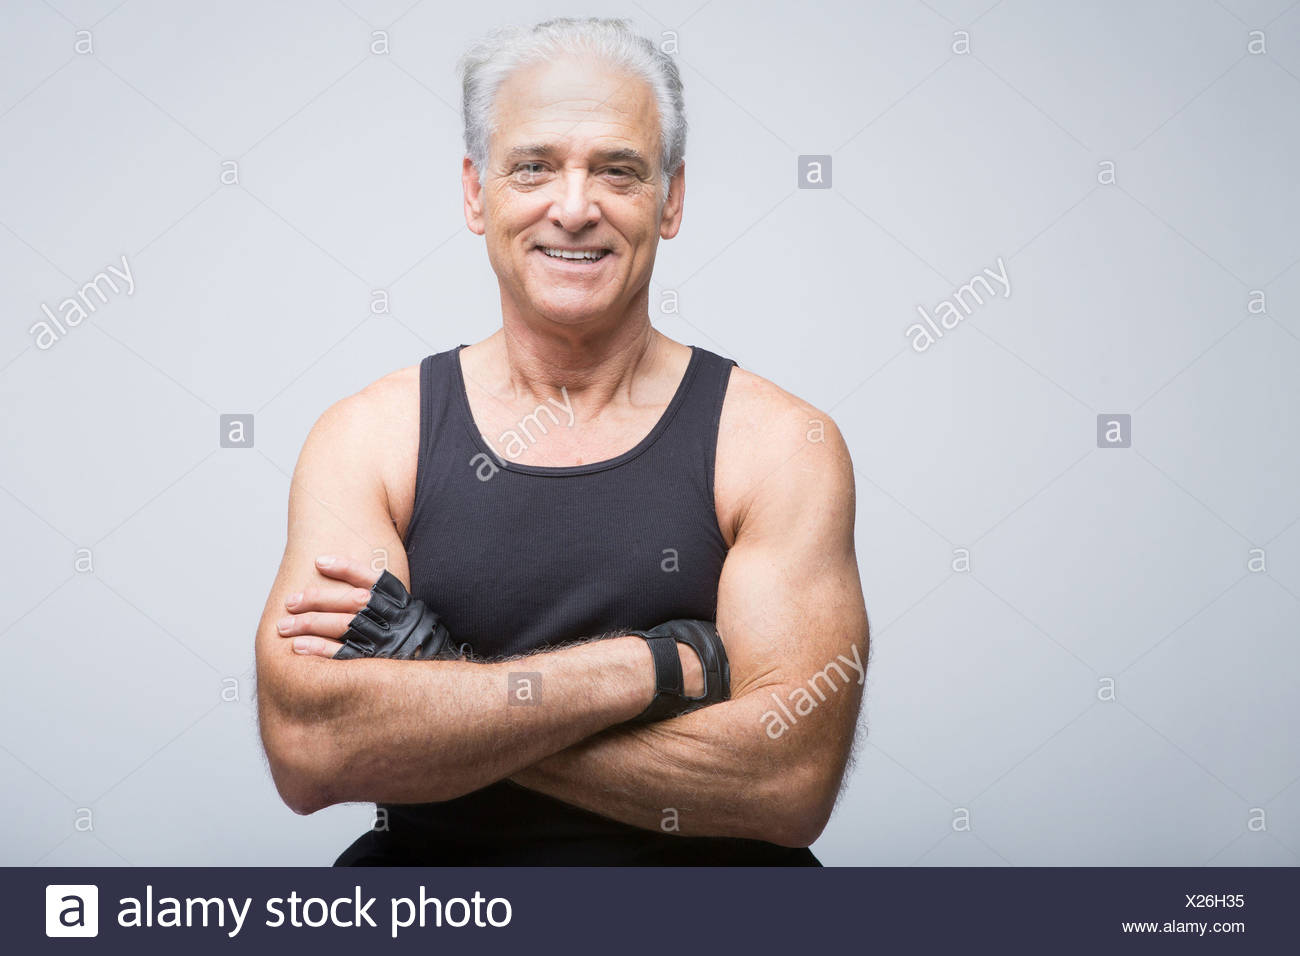 Senior woman in Sportbekleidung mit Arme gekreuzt, Porträt Stockbild